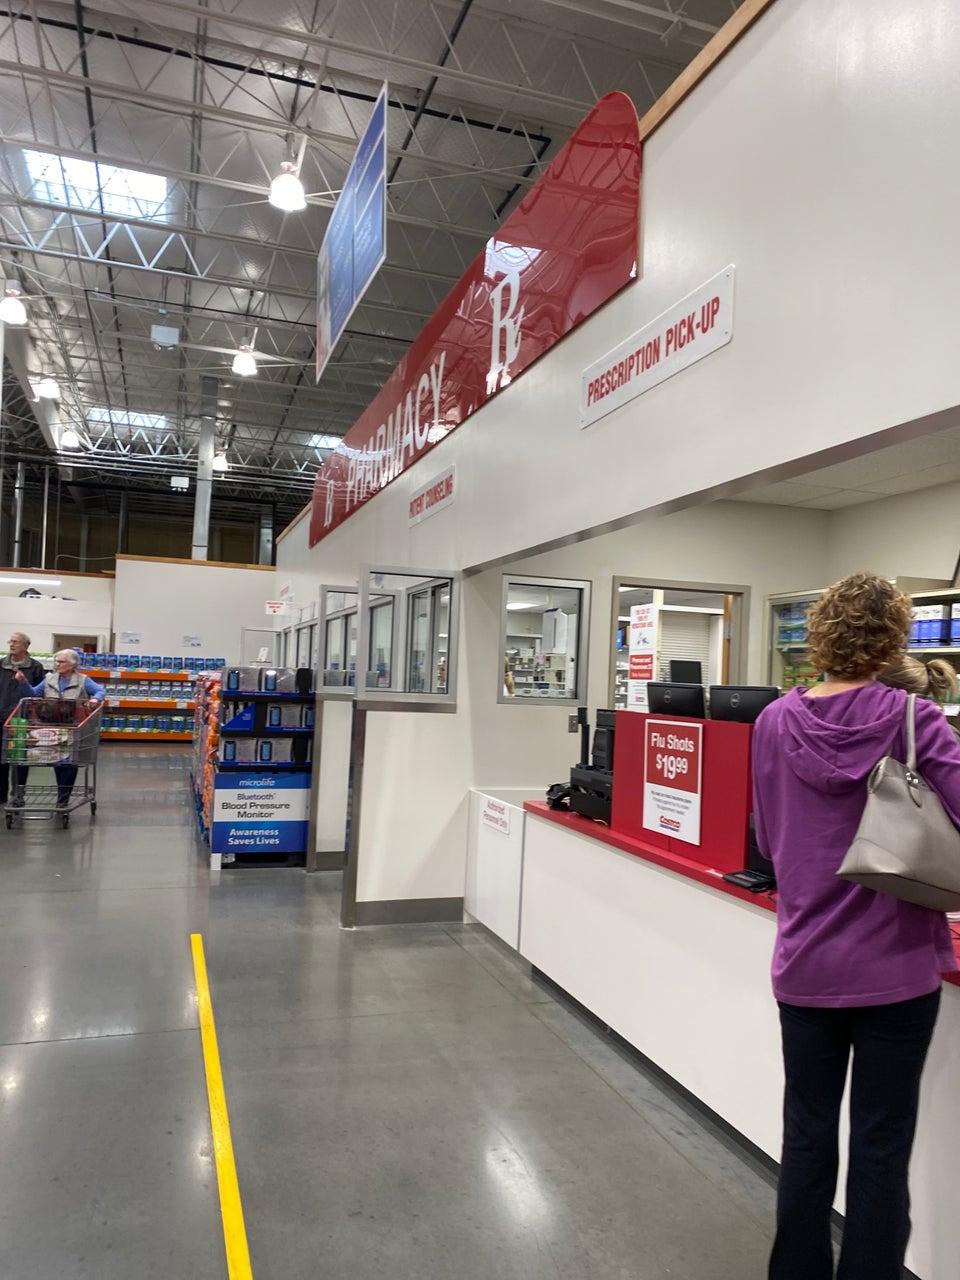 Costco Pharmacy 1021 Woodruff Rd, Greenville